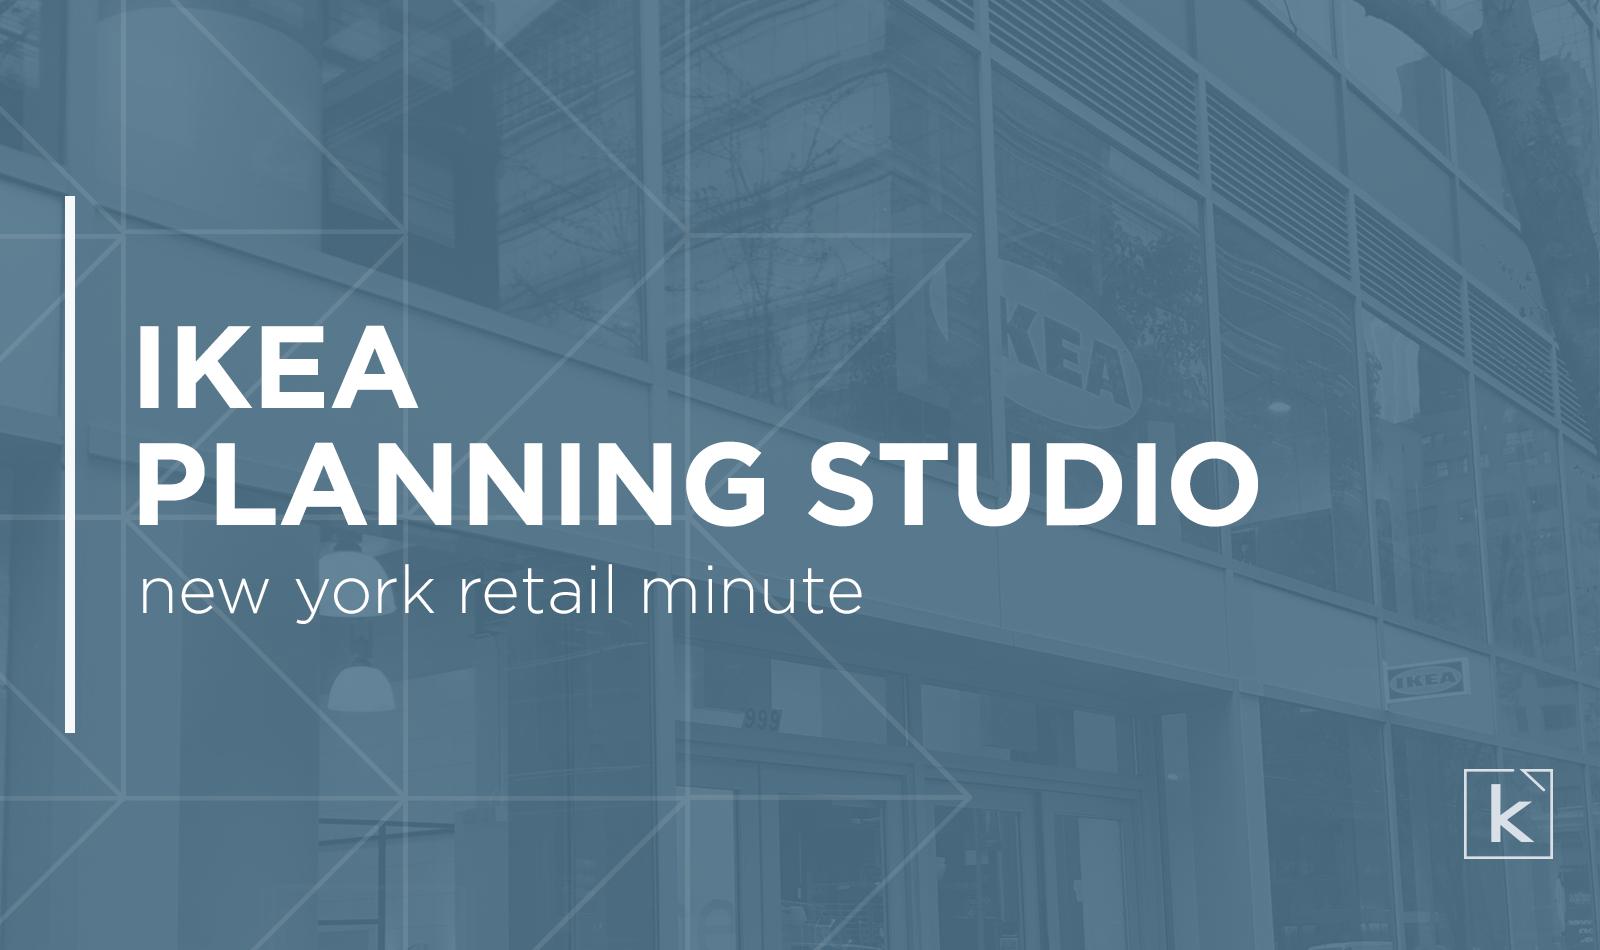 ikea-planning-studio-storefront